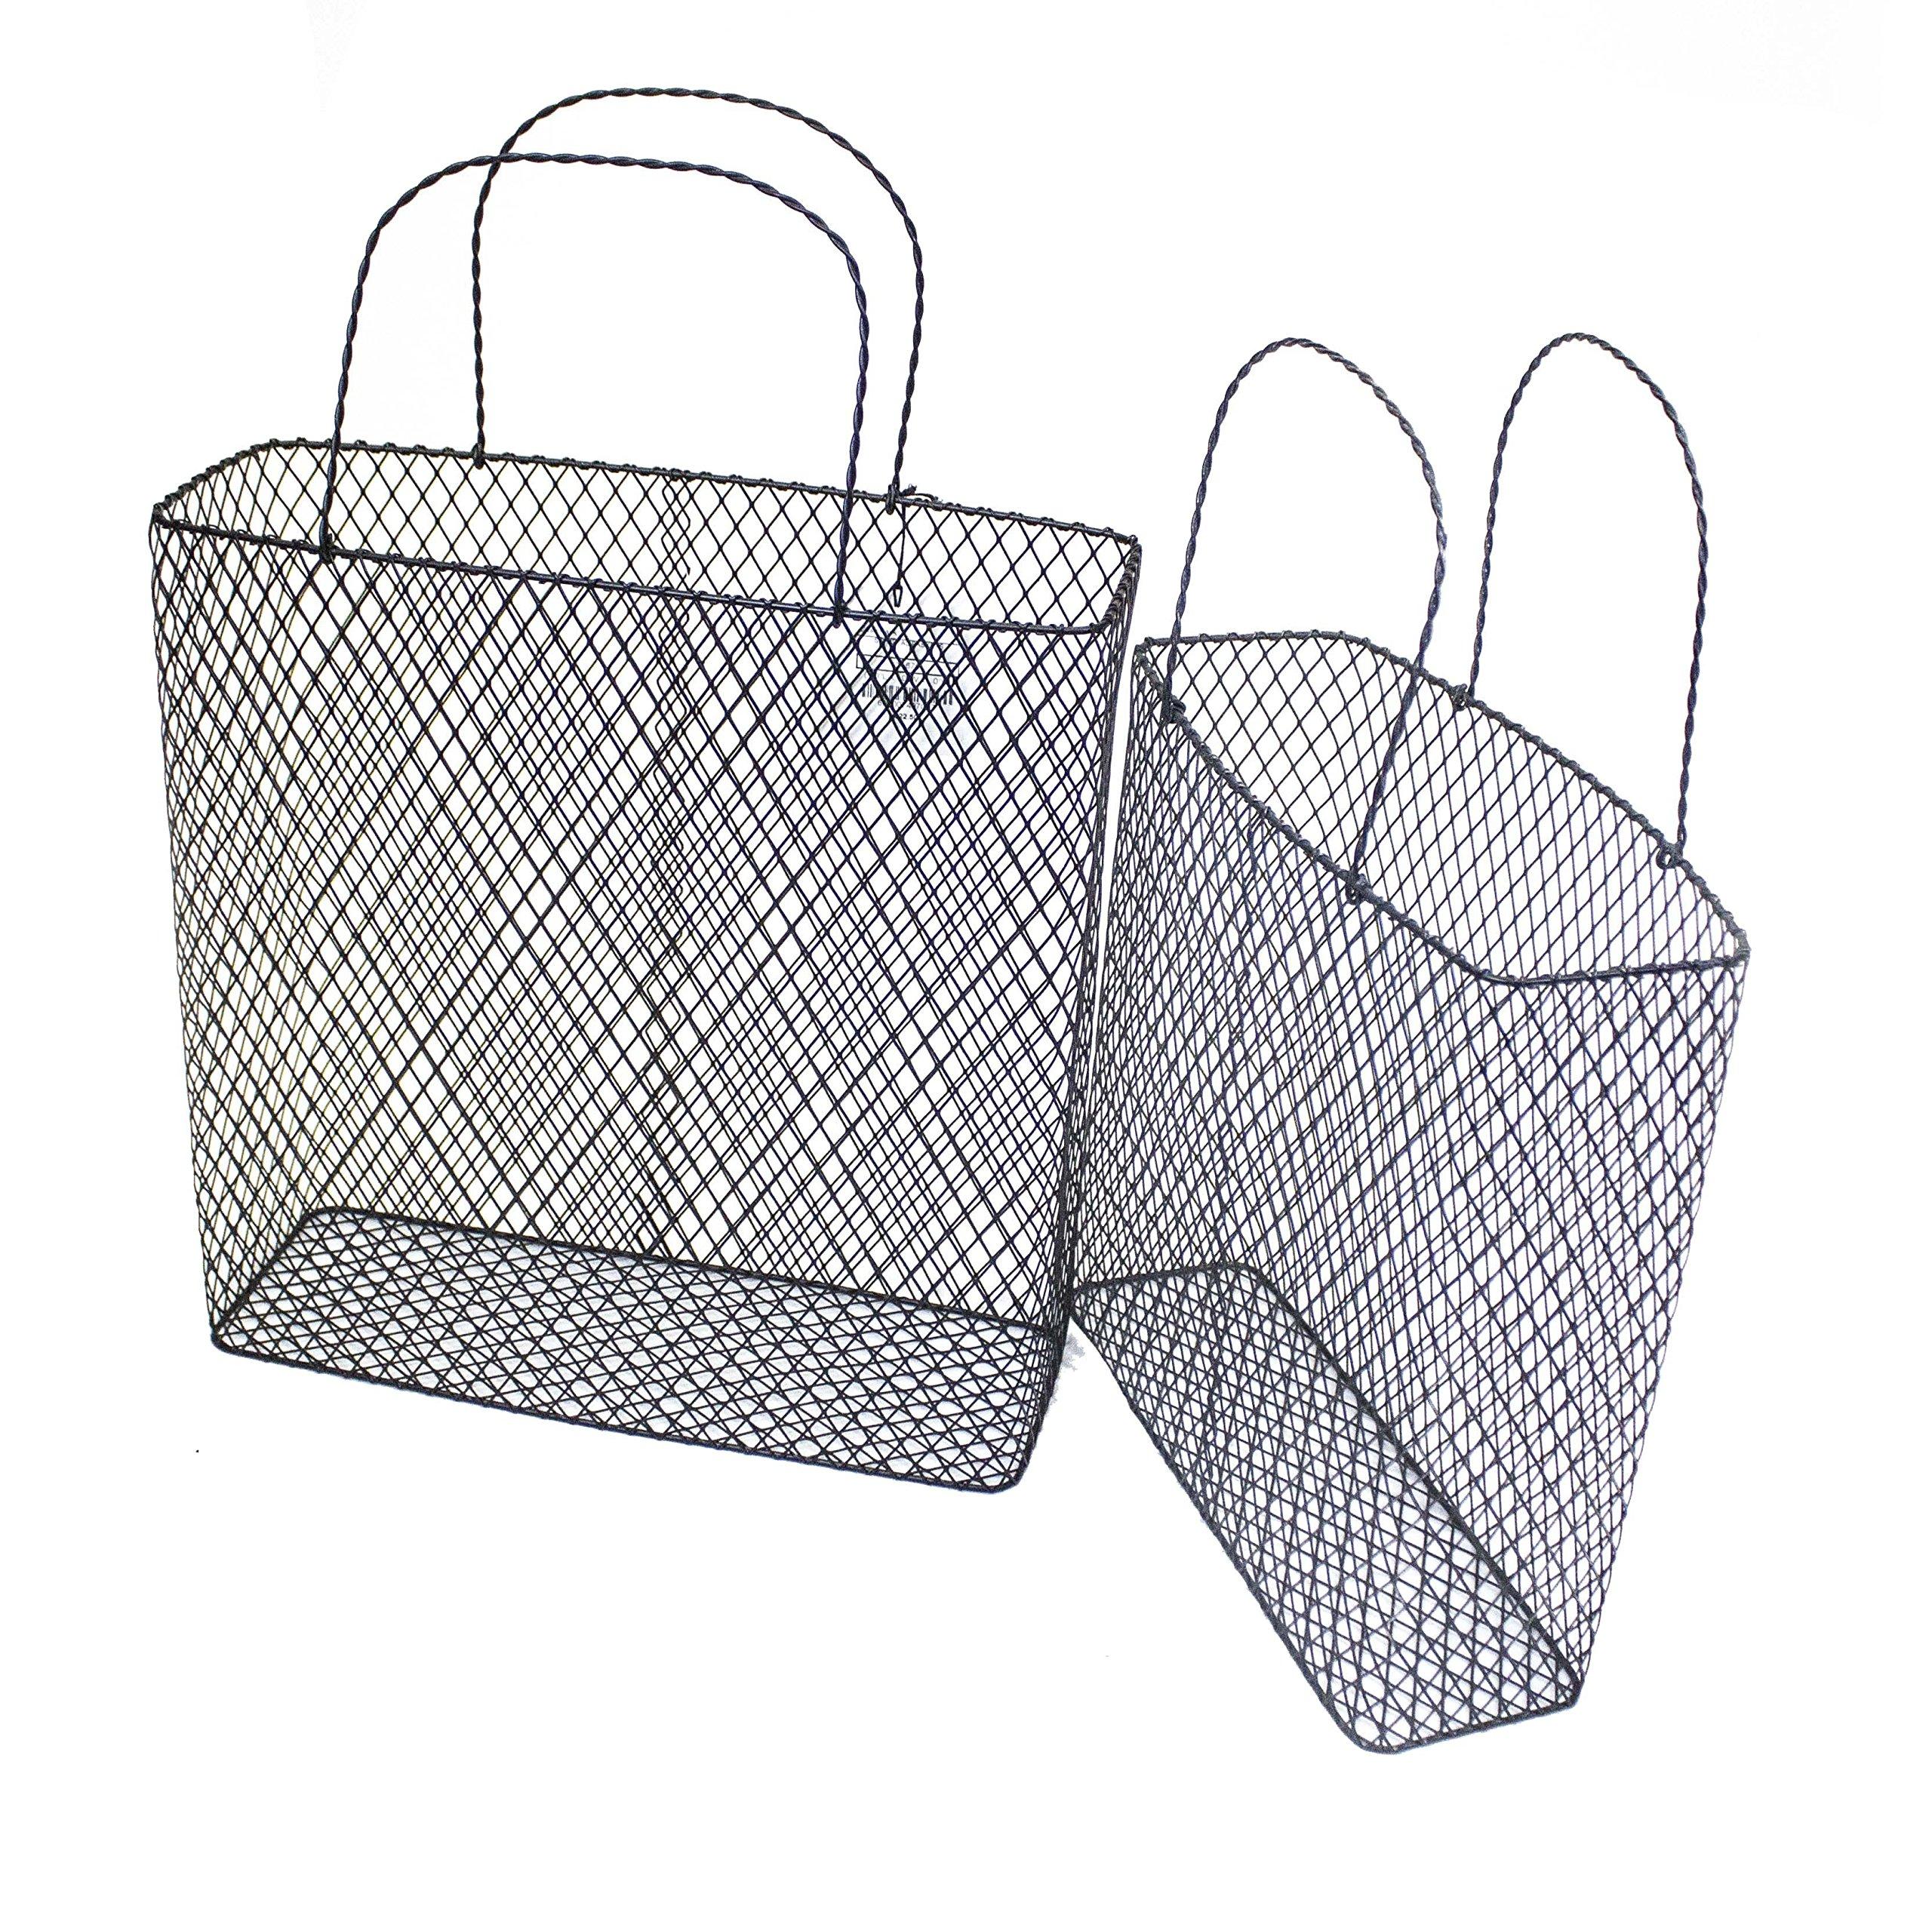 Sagebrook Home 11679 Handled Metal Baskets Metal, 14.5 x 5 x 20 Inches (Set of 2)